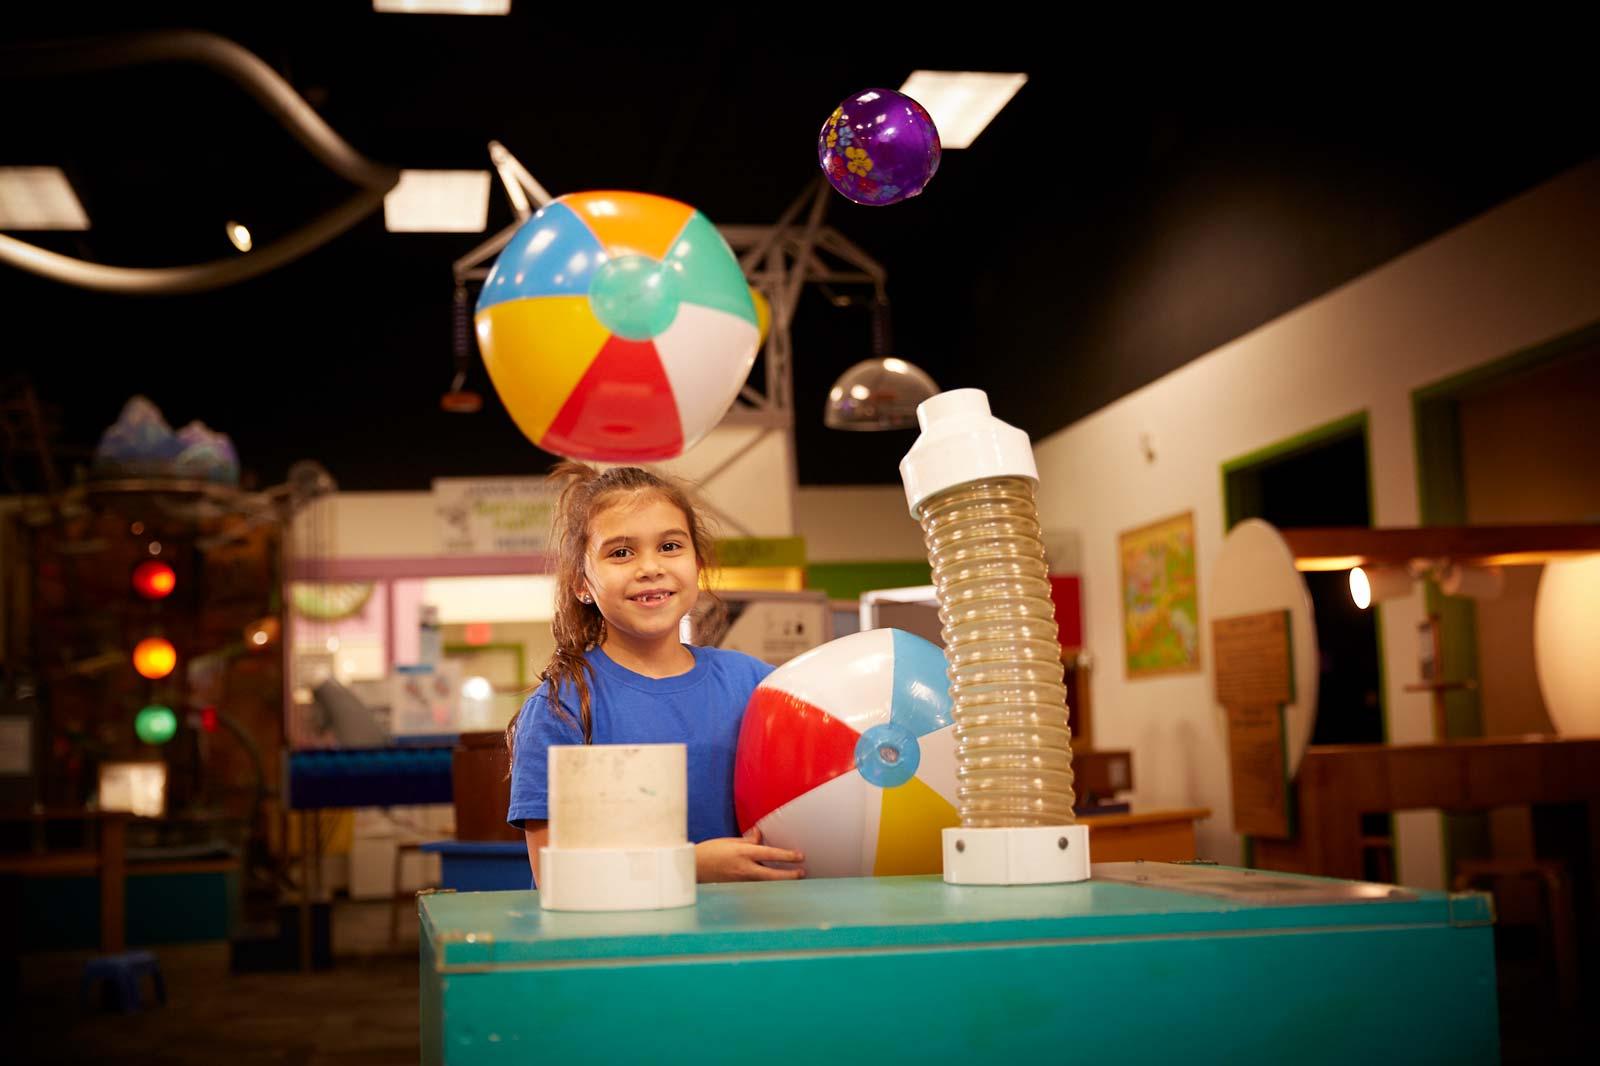 eugene-science-center-exhibits